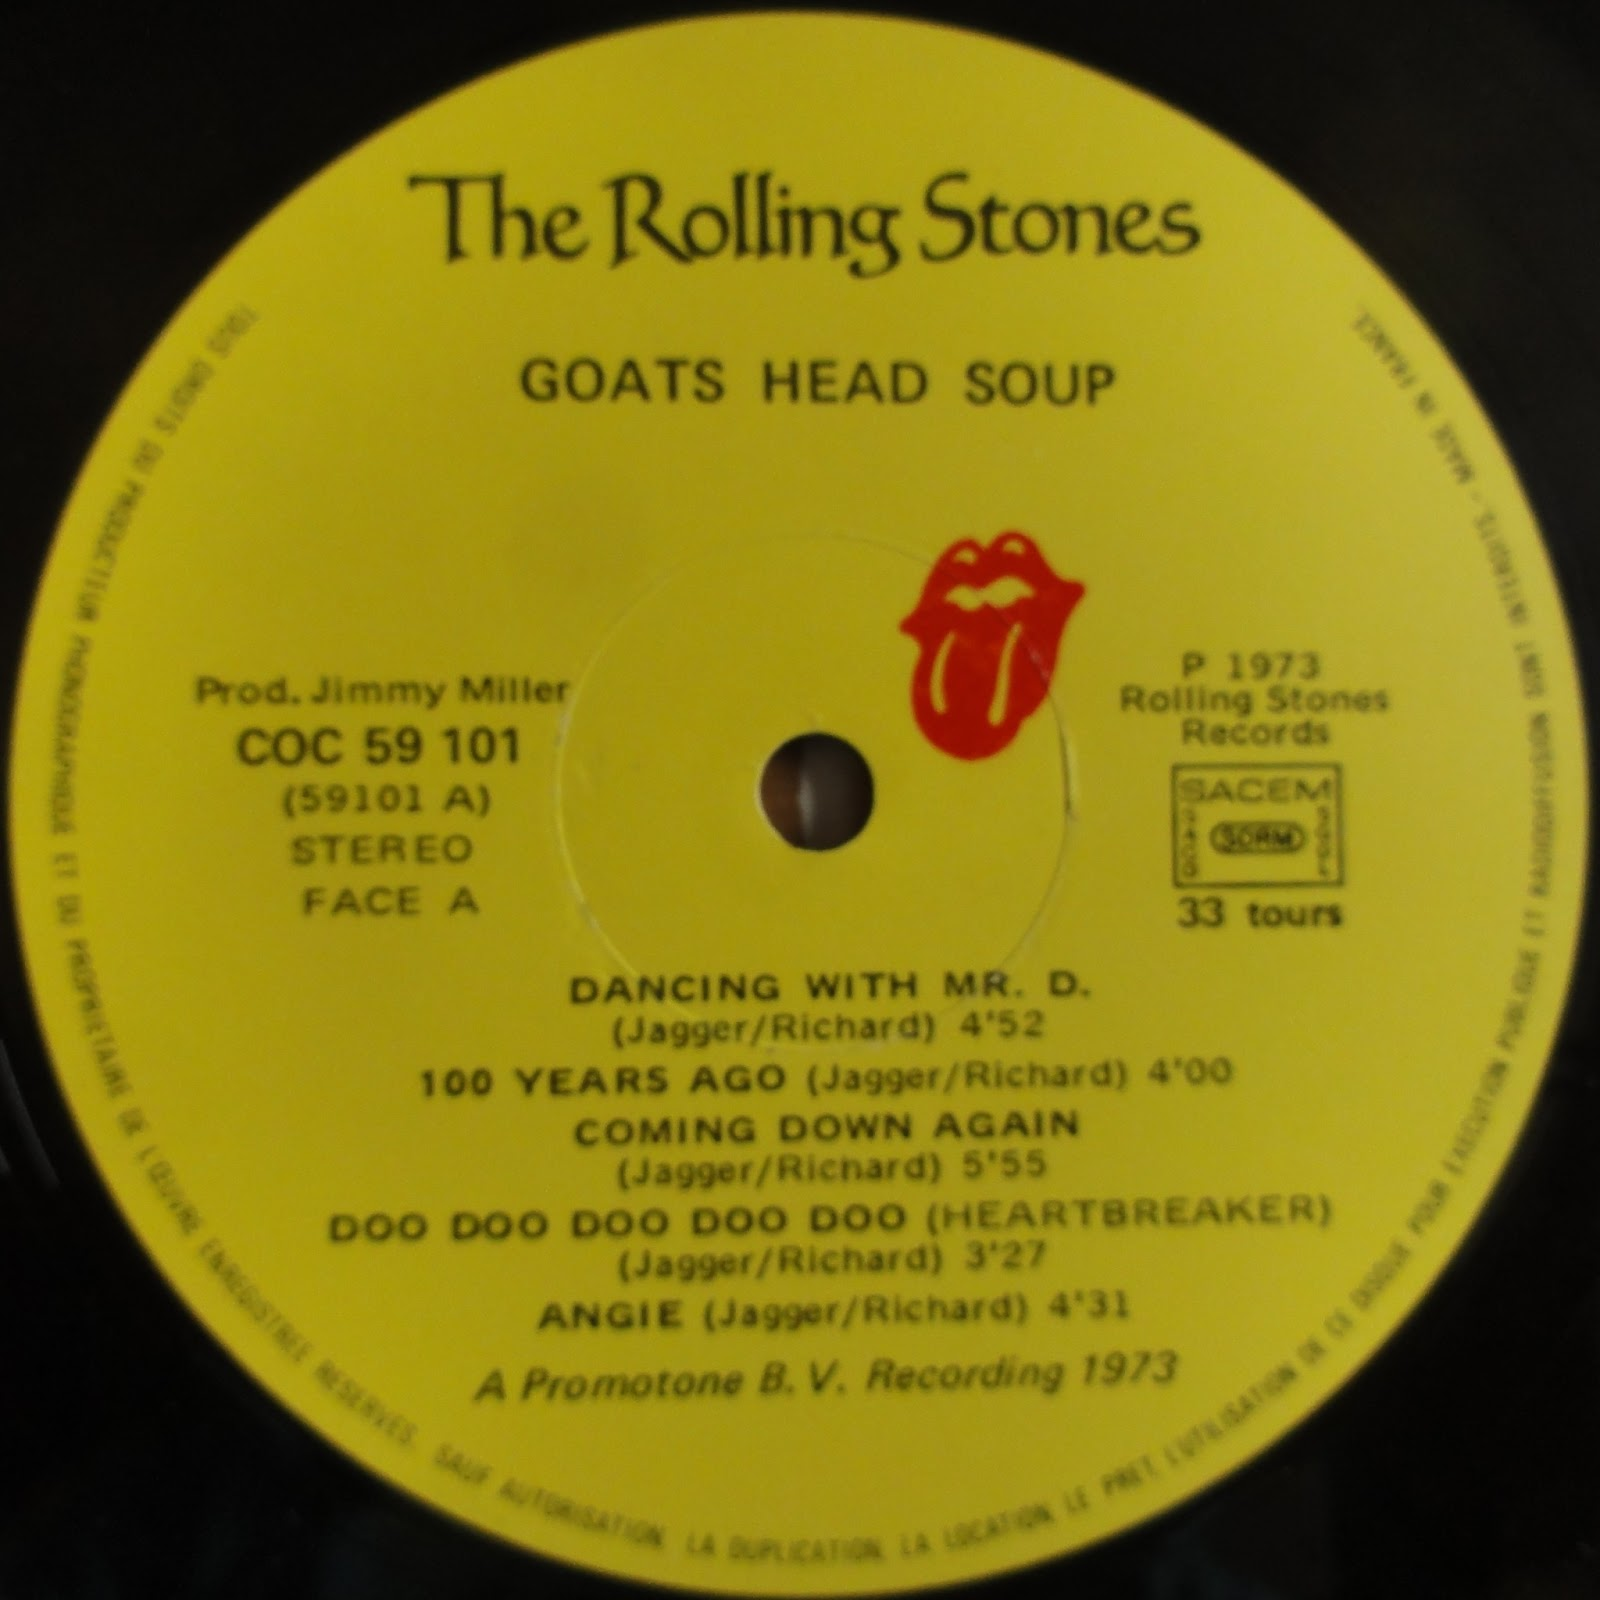 Download Rolling Stones Goats Head Soup Rar